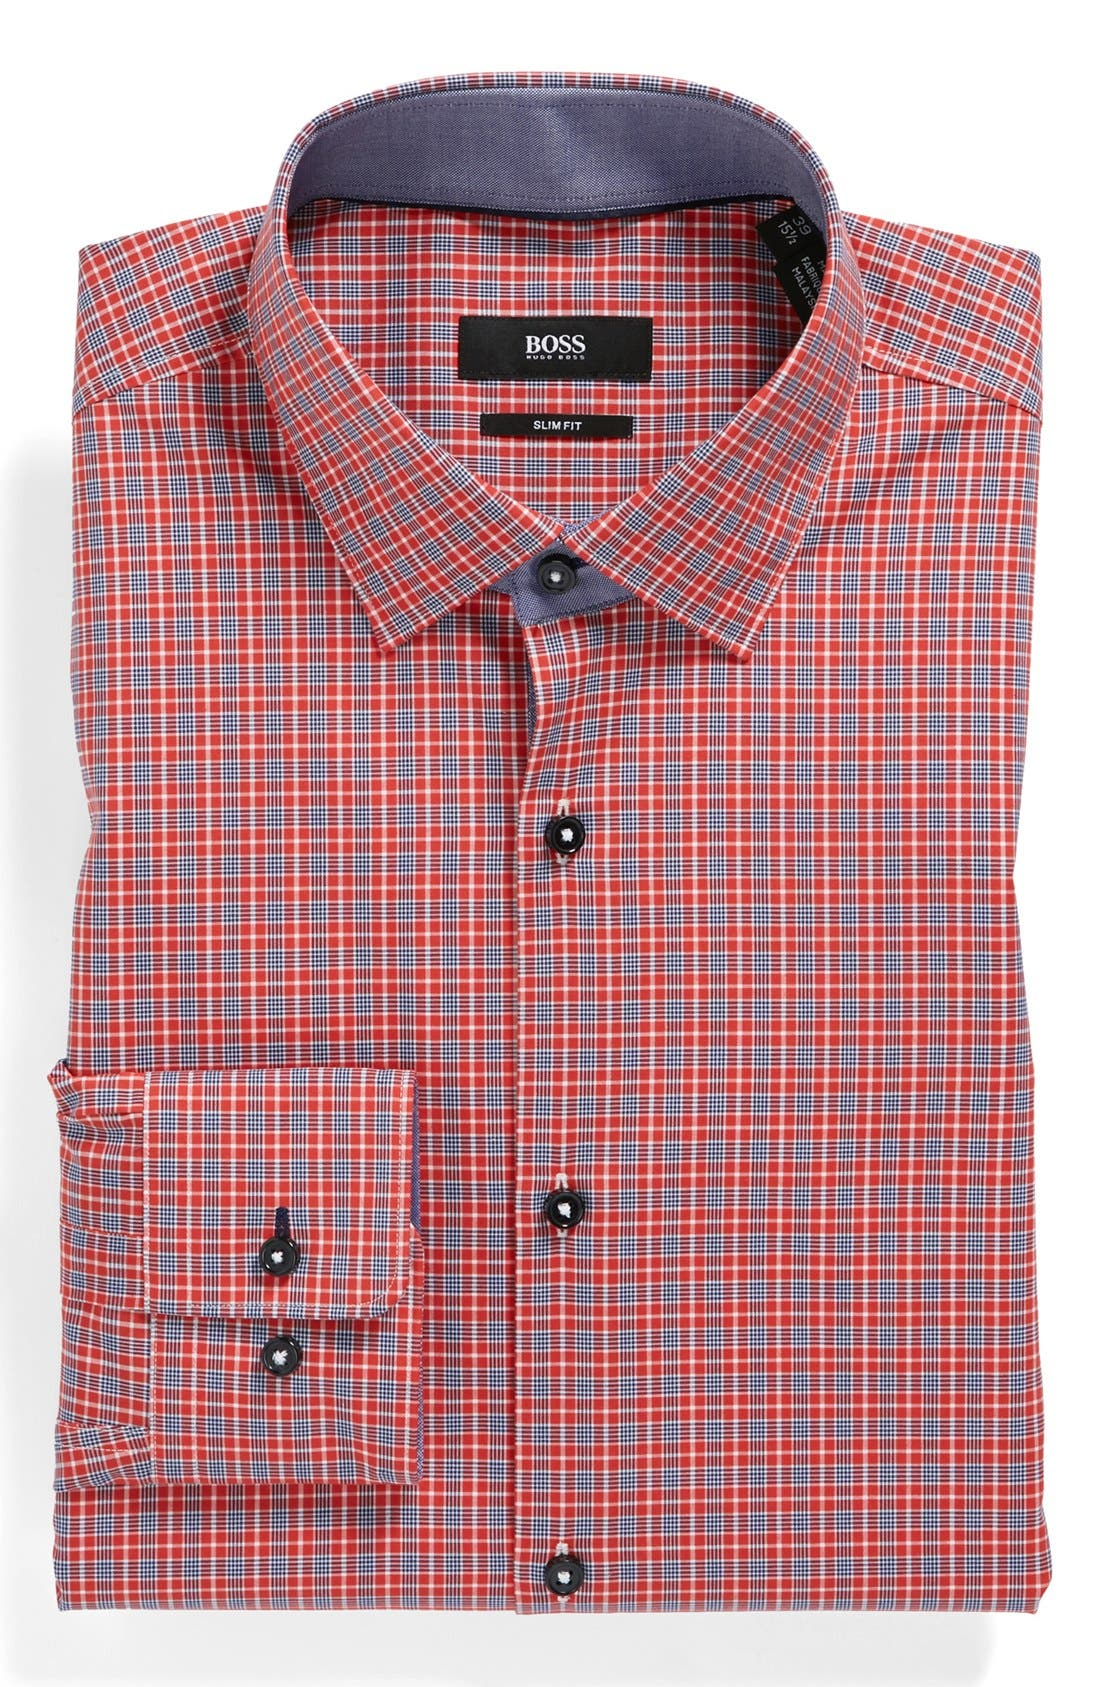 Alternate Image 1 Selected - BOSS HUGO BOSS 'Juri' Slim Fit Easy Iron Dress Shirt